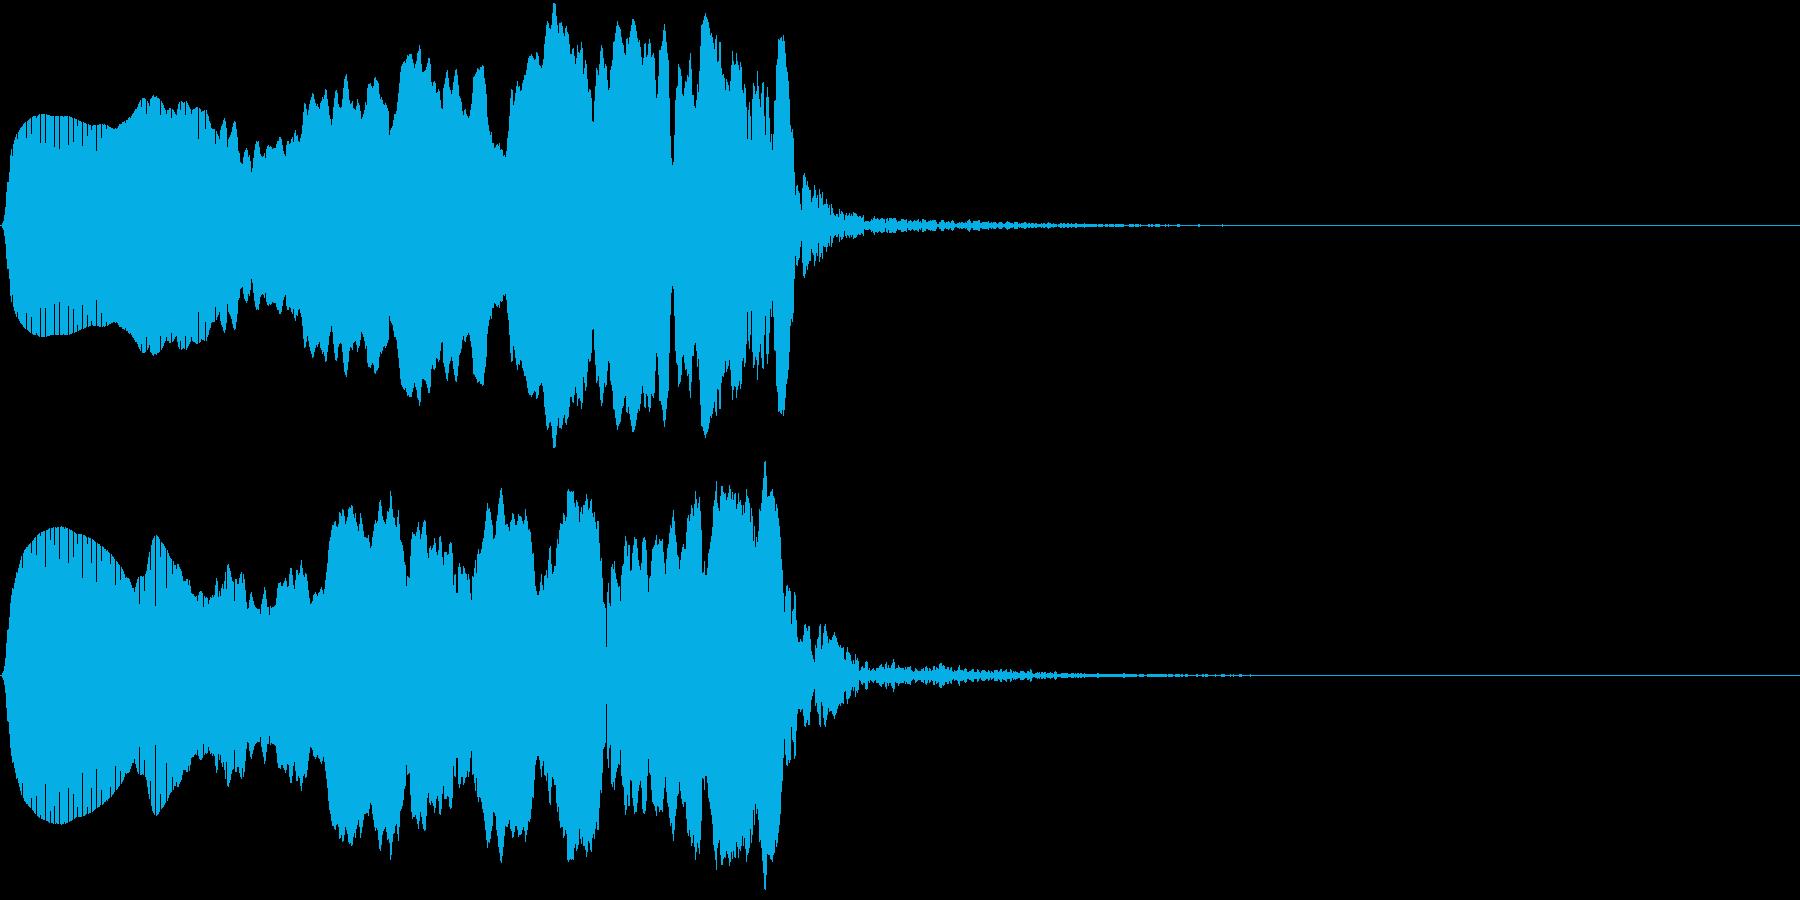 TVFX 「?」の効果音 はてな 1の再生済みの波形